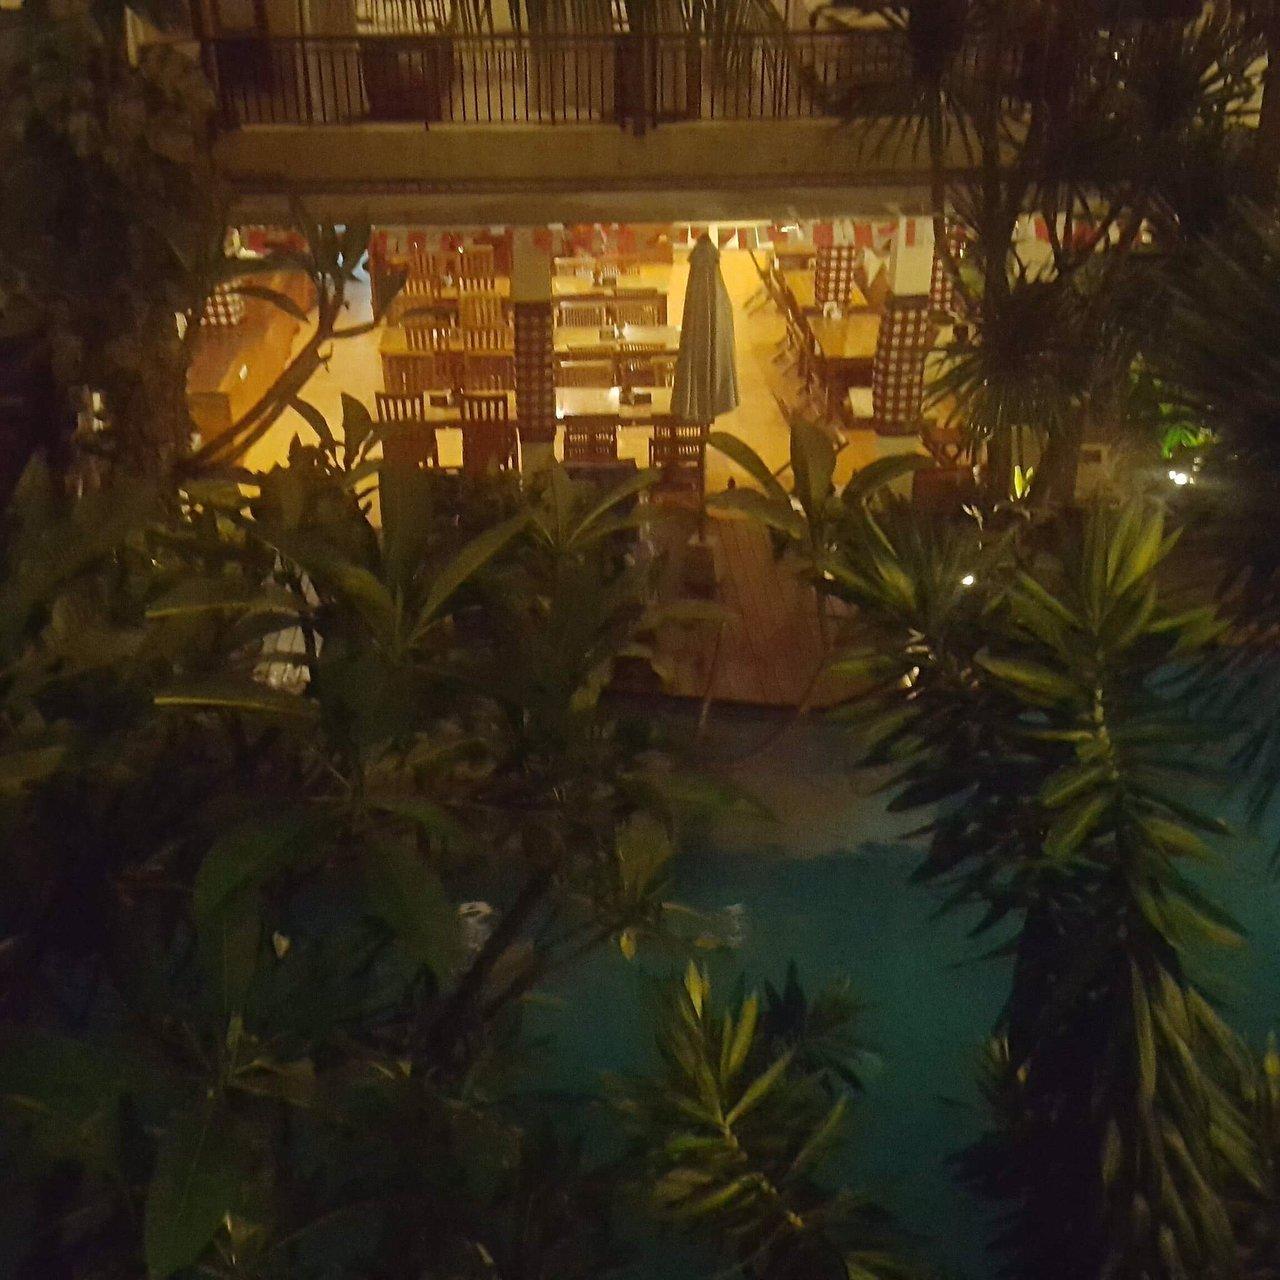 manggar indonesia hotel residence 13 5 6 updated 2019 rh tripadvisor com